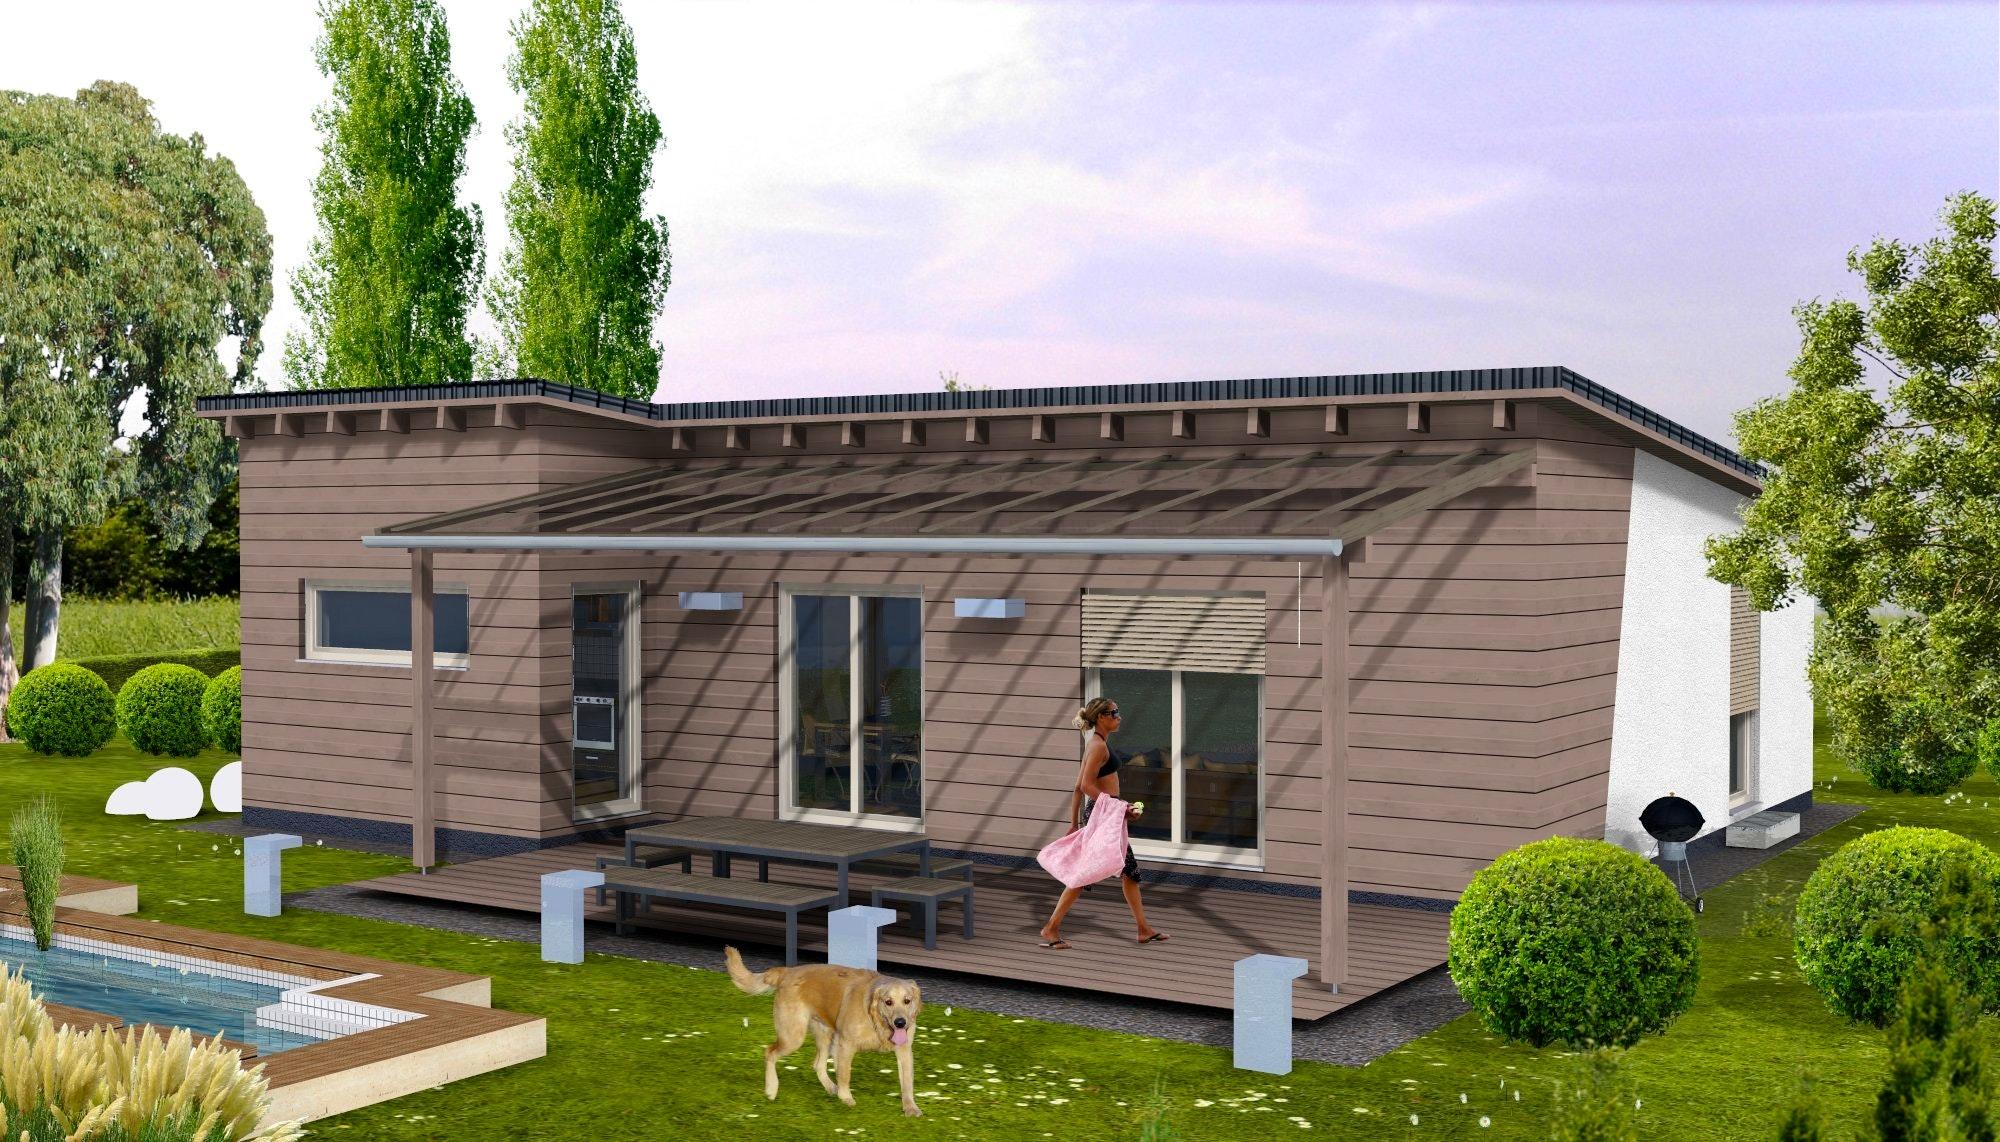 losleben-Haus Nr. 4 exterior 0